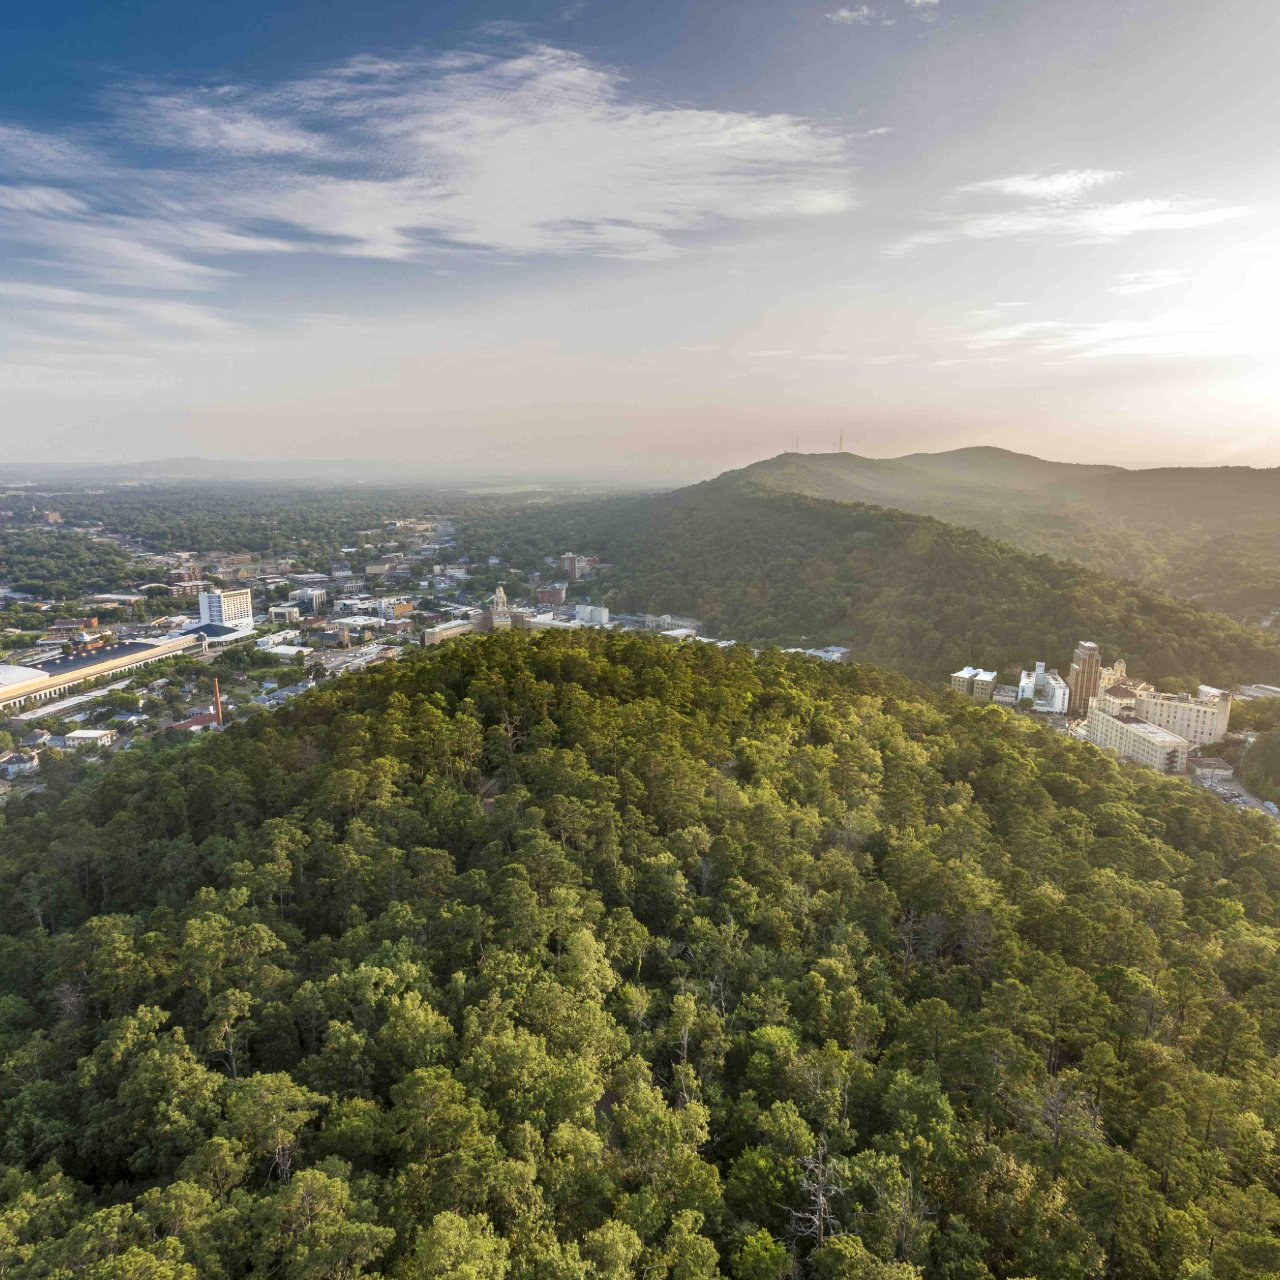 Aerial - Hot Springs, Arkansas